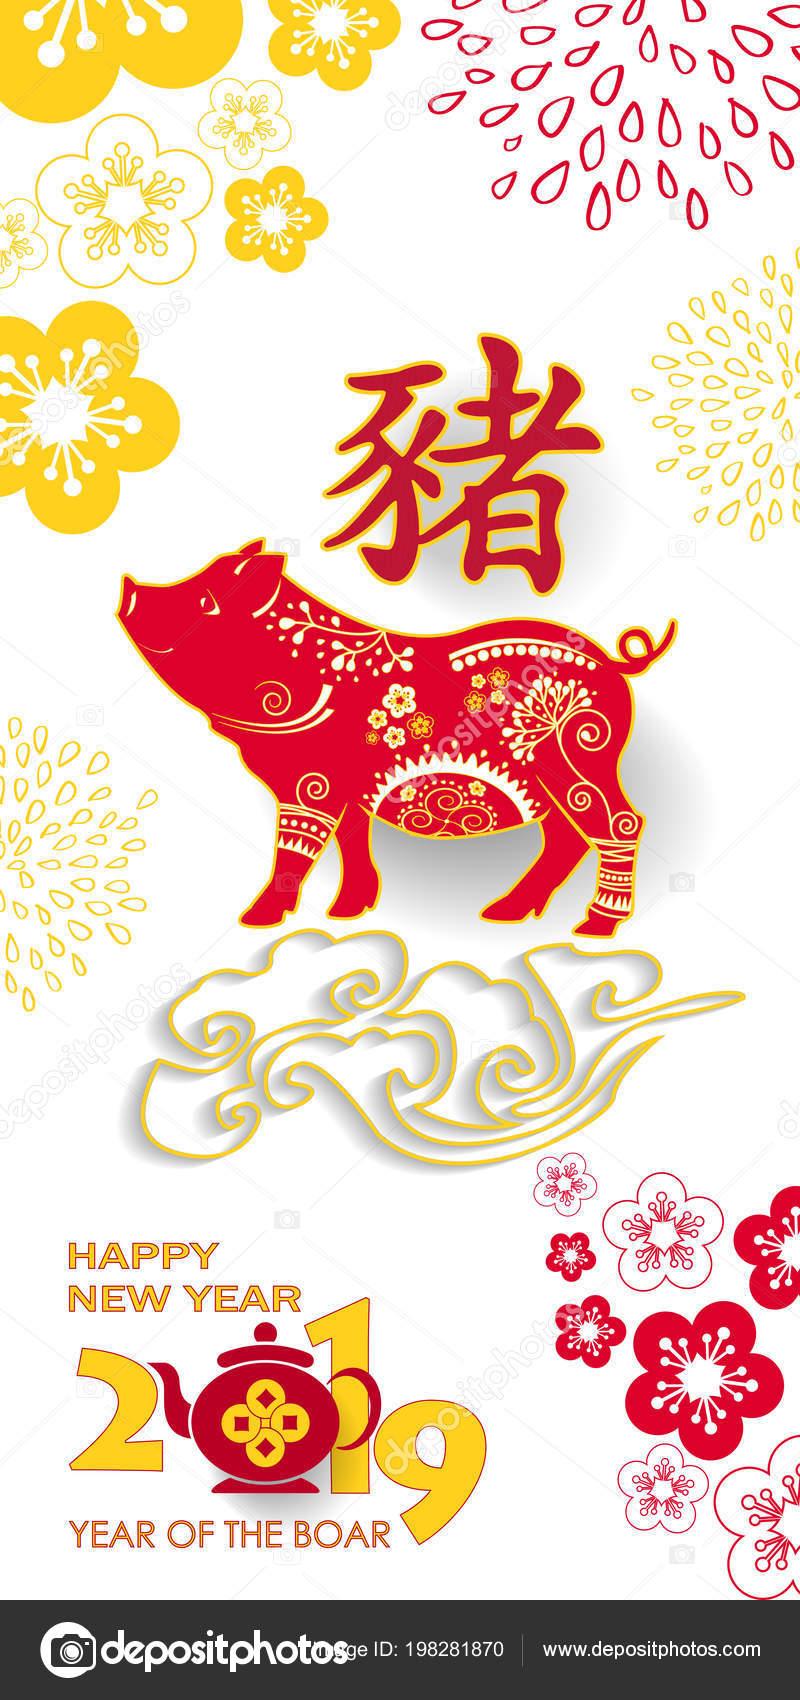 https://st4.depositphotos.com/10507282/19828/v/1600/depositphotos_198281870-stock-illustration-happy-chinese-new-year-2019.jpg